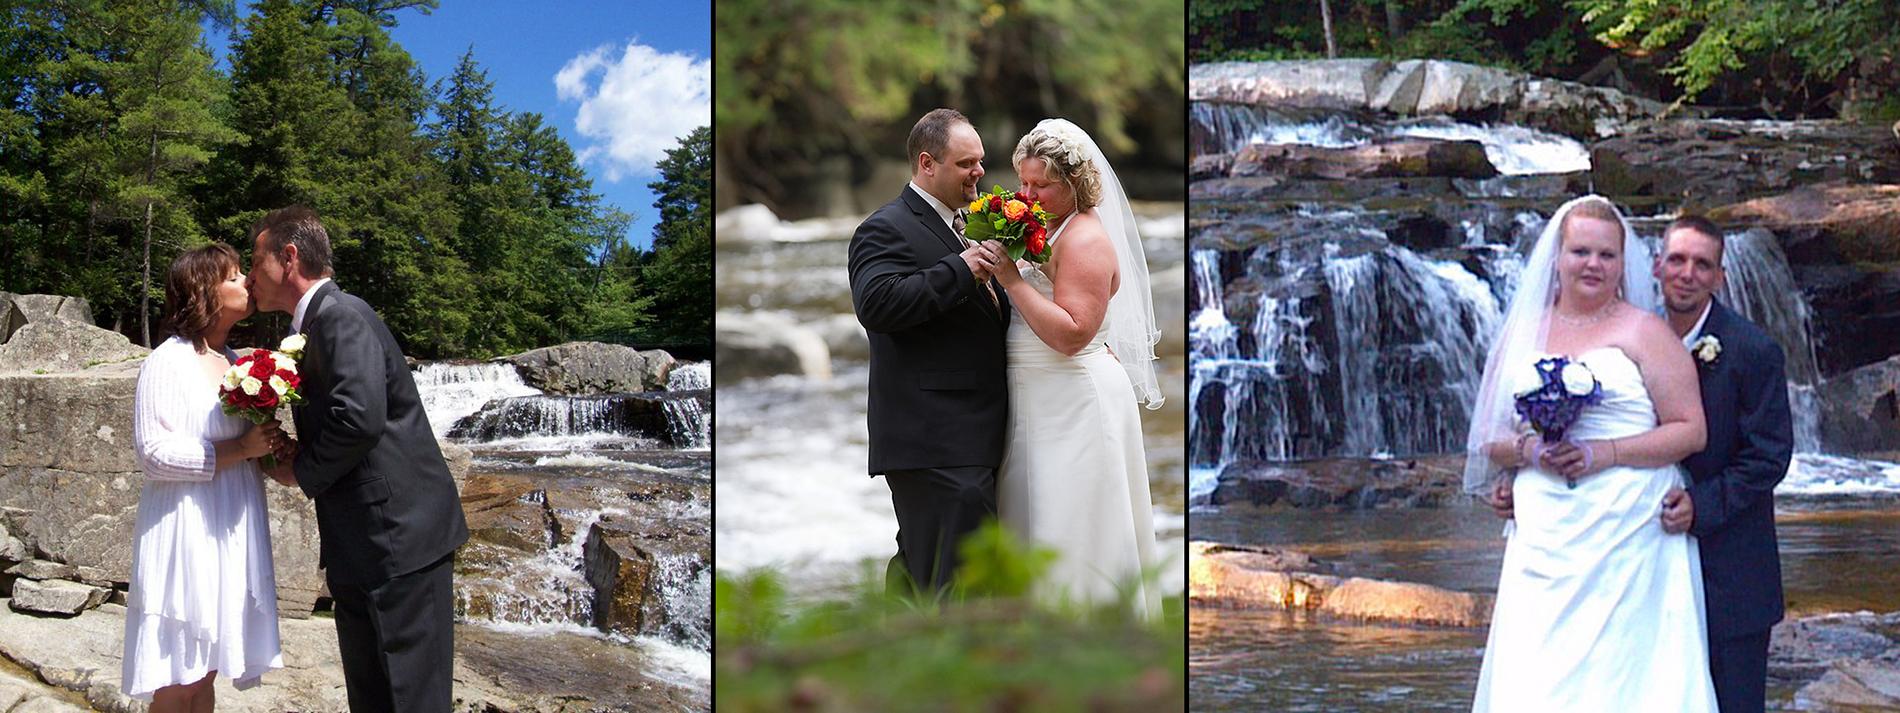 Collage of bride & groom at Jackson Falls, bride & groom on covered bridge, bride & groom standing with Jackson Falls behind